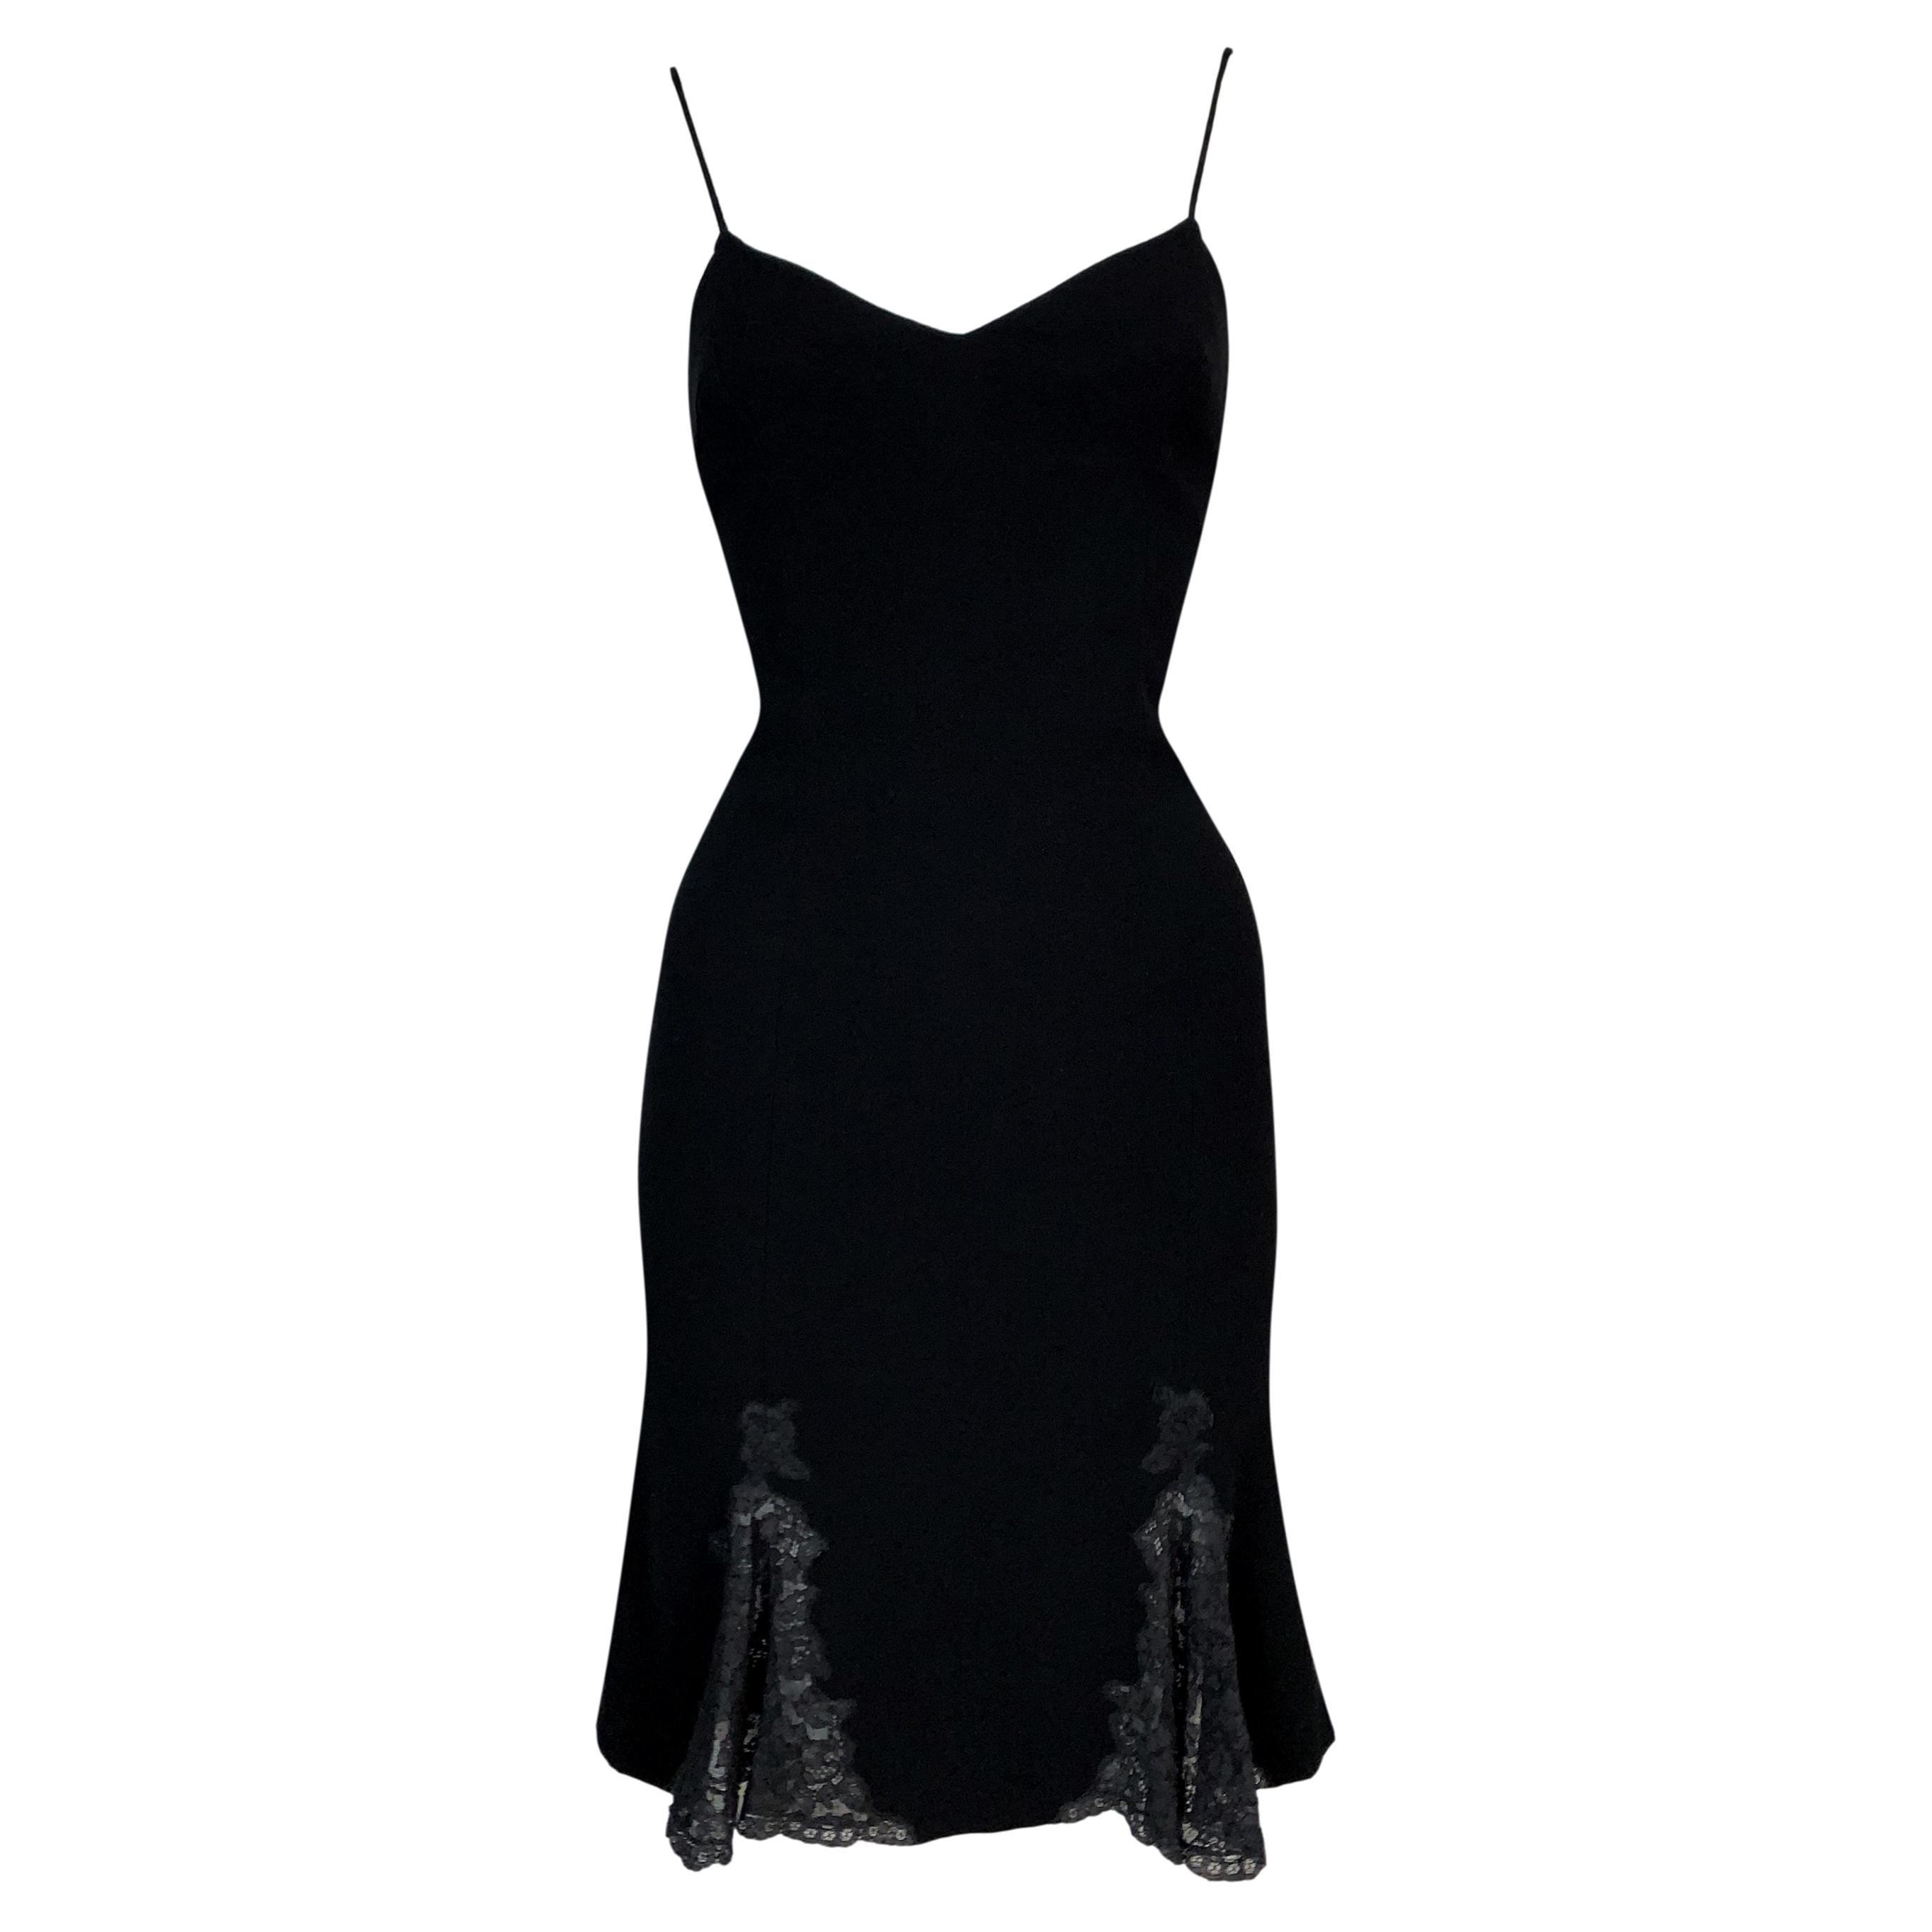 F/W 1998 Christian Dior by John Galliano Black Fit n Flare Lace Dress